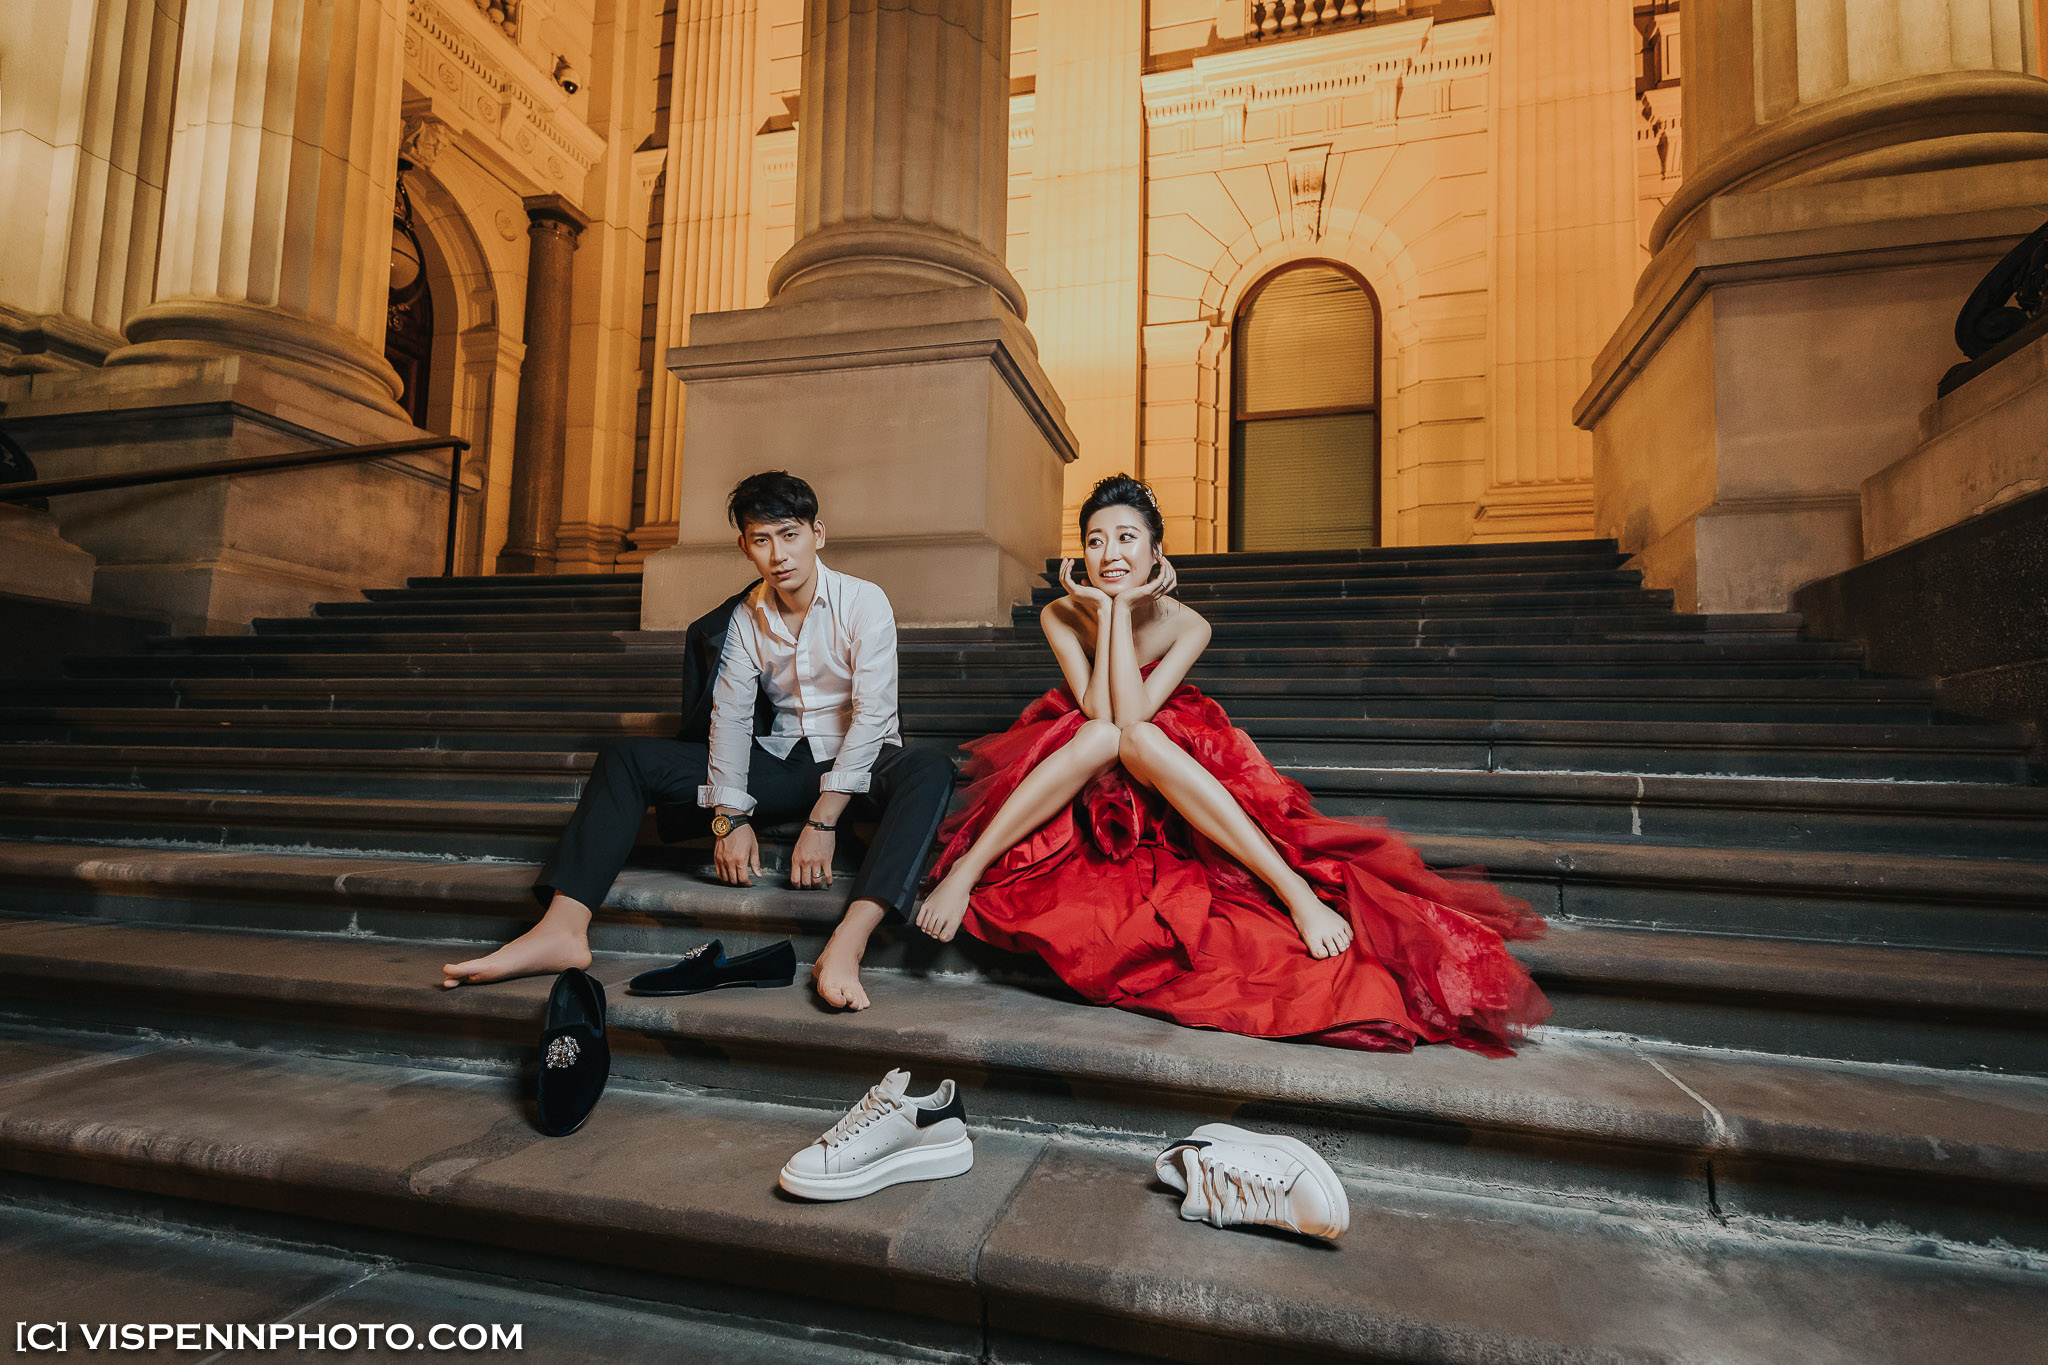 PRE WEDDING Photography Melbourne VISPENN 墨尔本 婚纱照 结婚照 婚纱摄影 5D4 4405